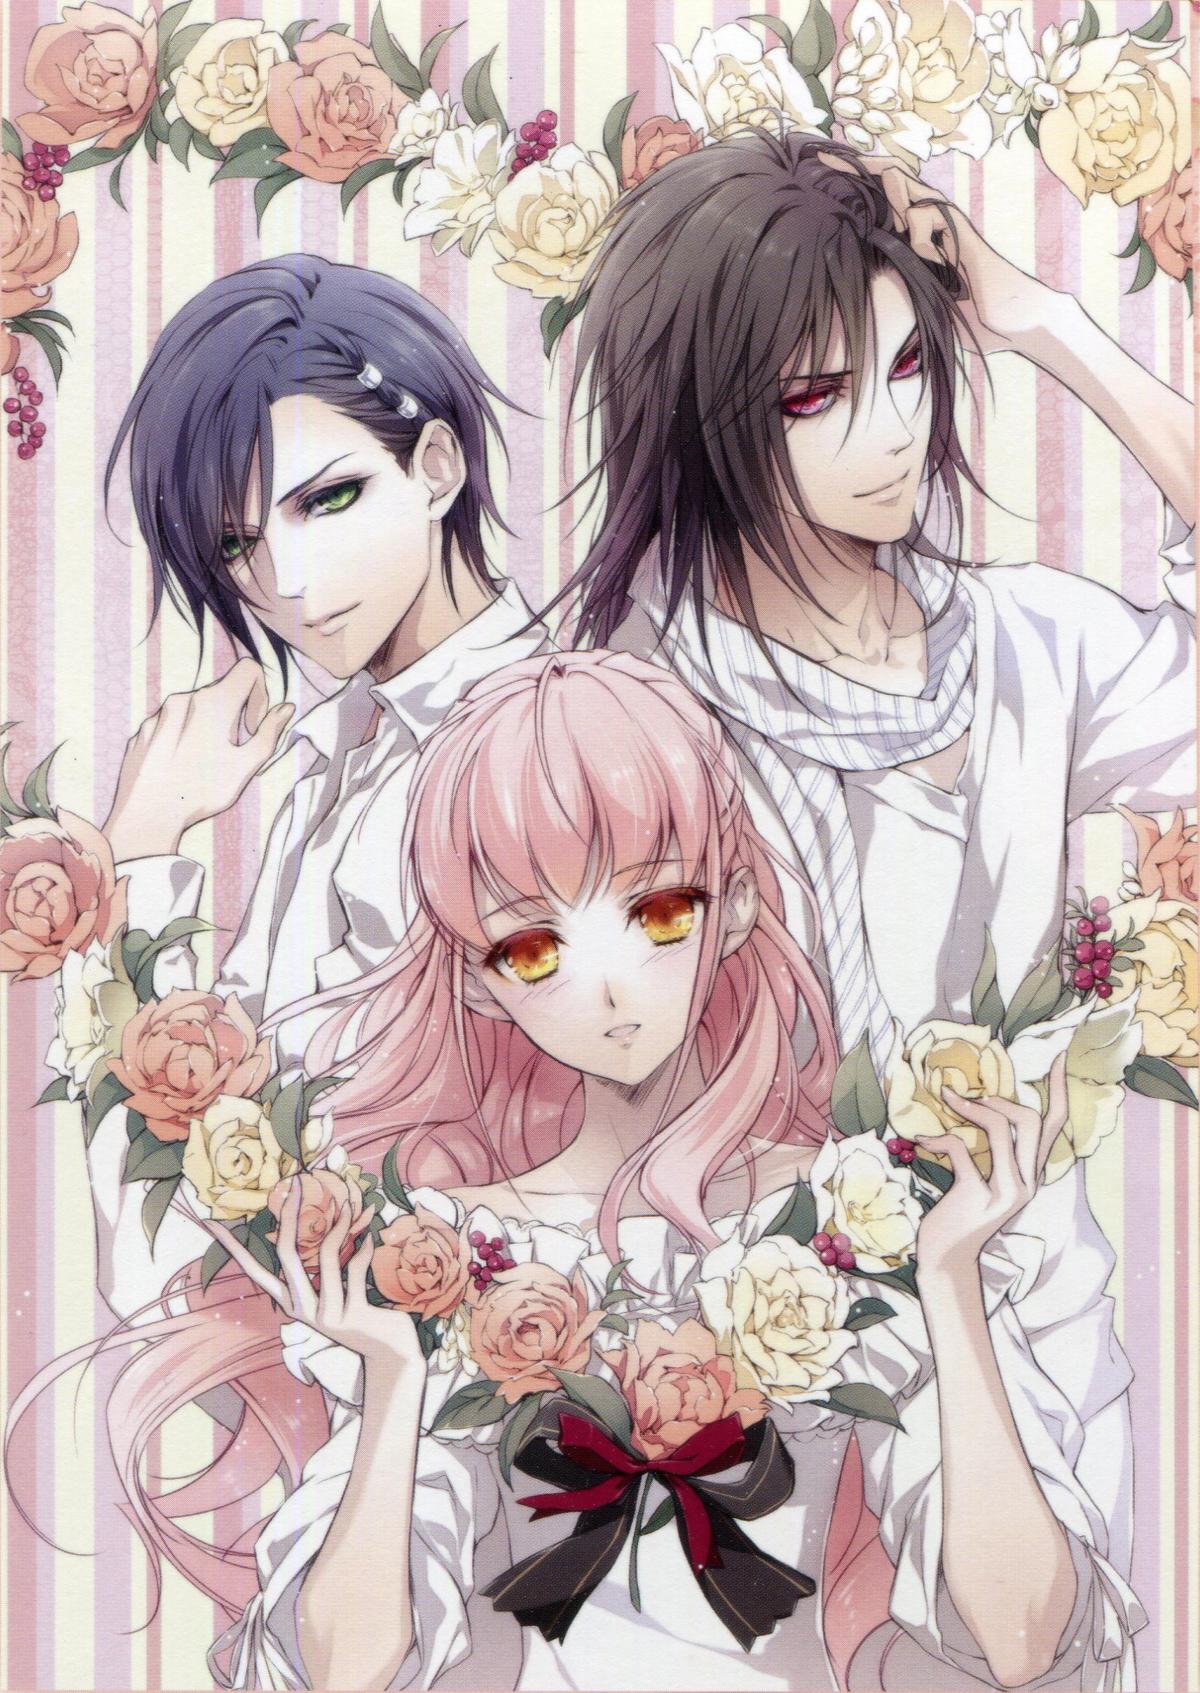 Est Rinaudo - Zerochan Anime Image Board